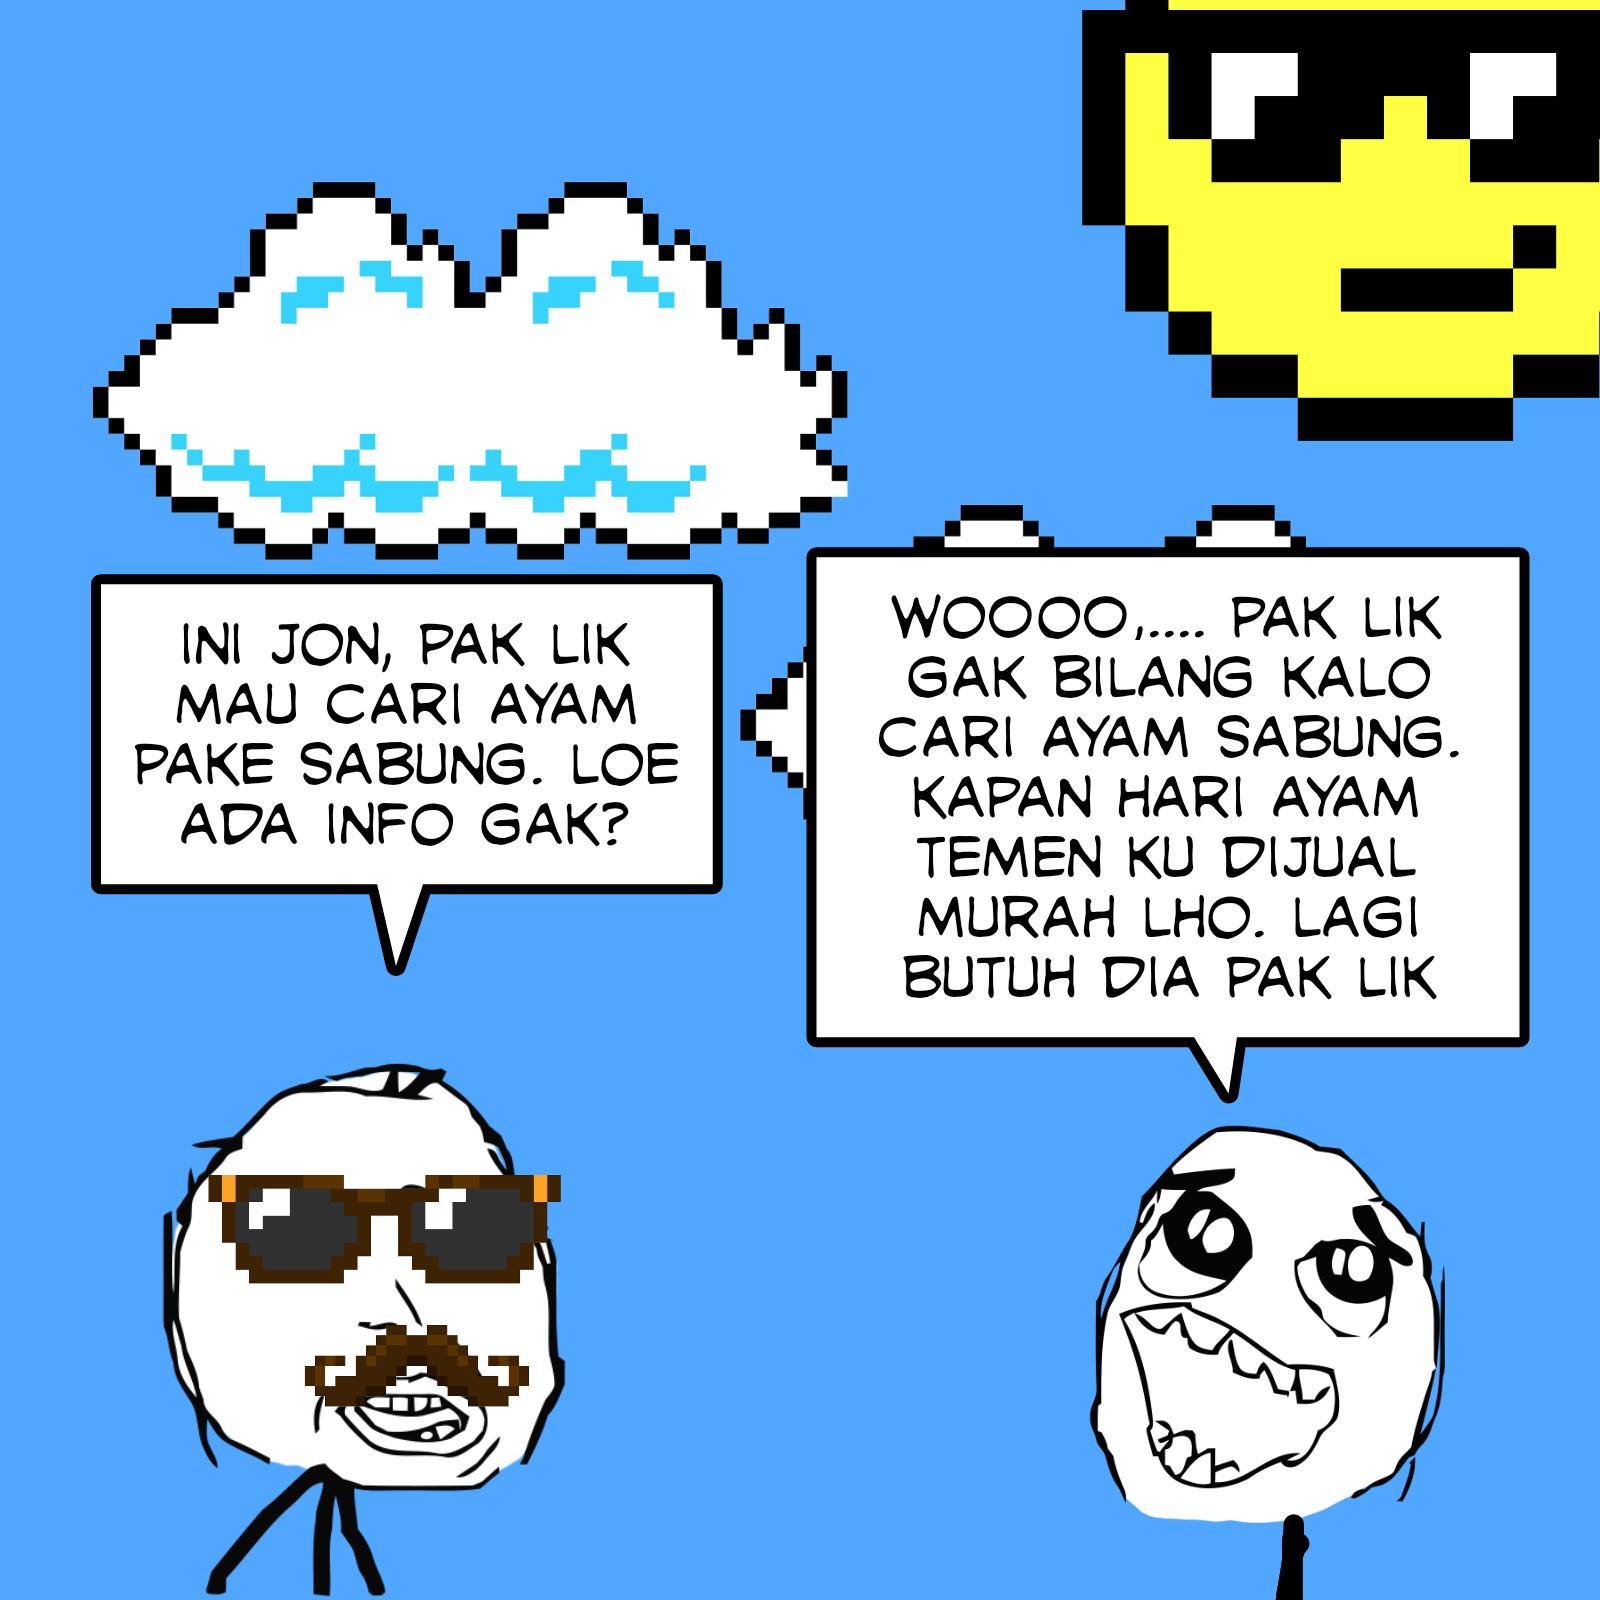 Baca comic strip kok kezel ya, rage comic, meme comic, web toon, web comic bahasa Indonesia